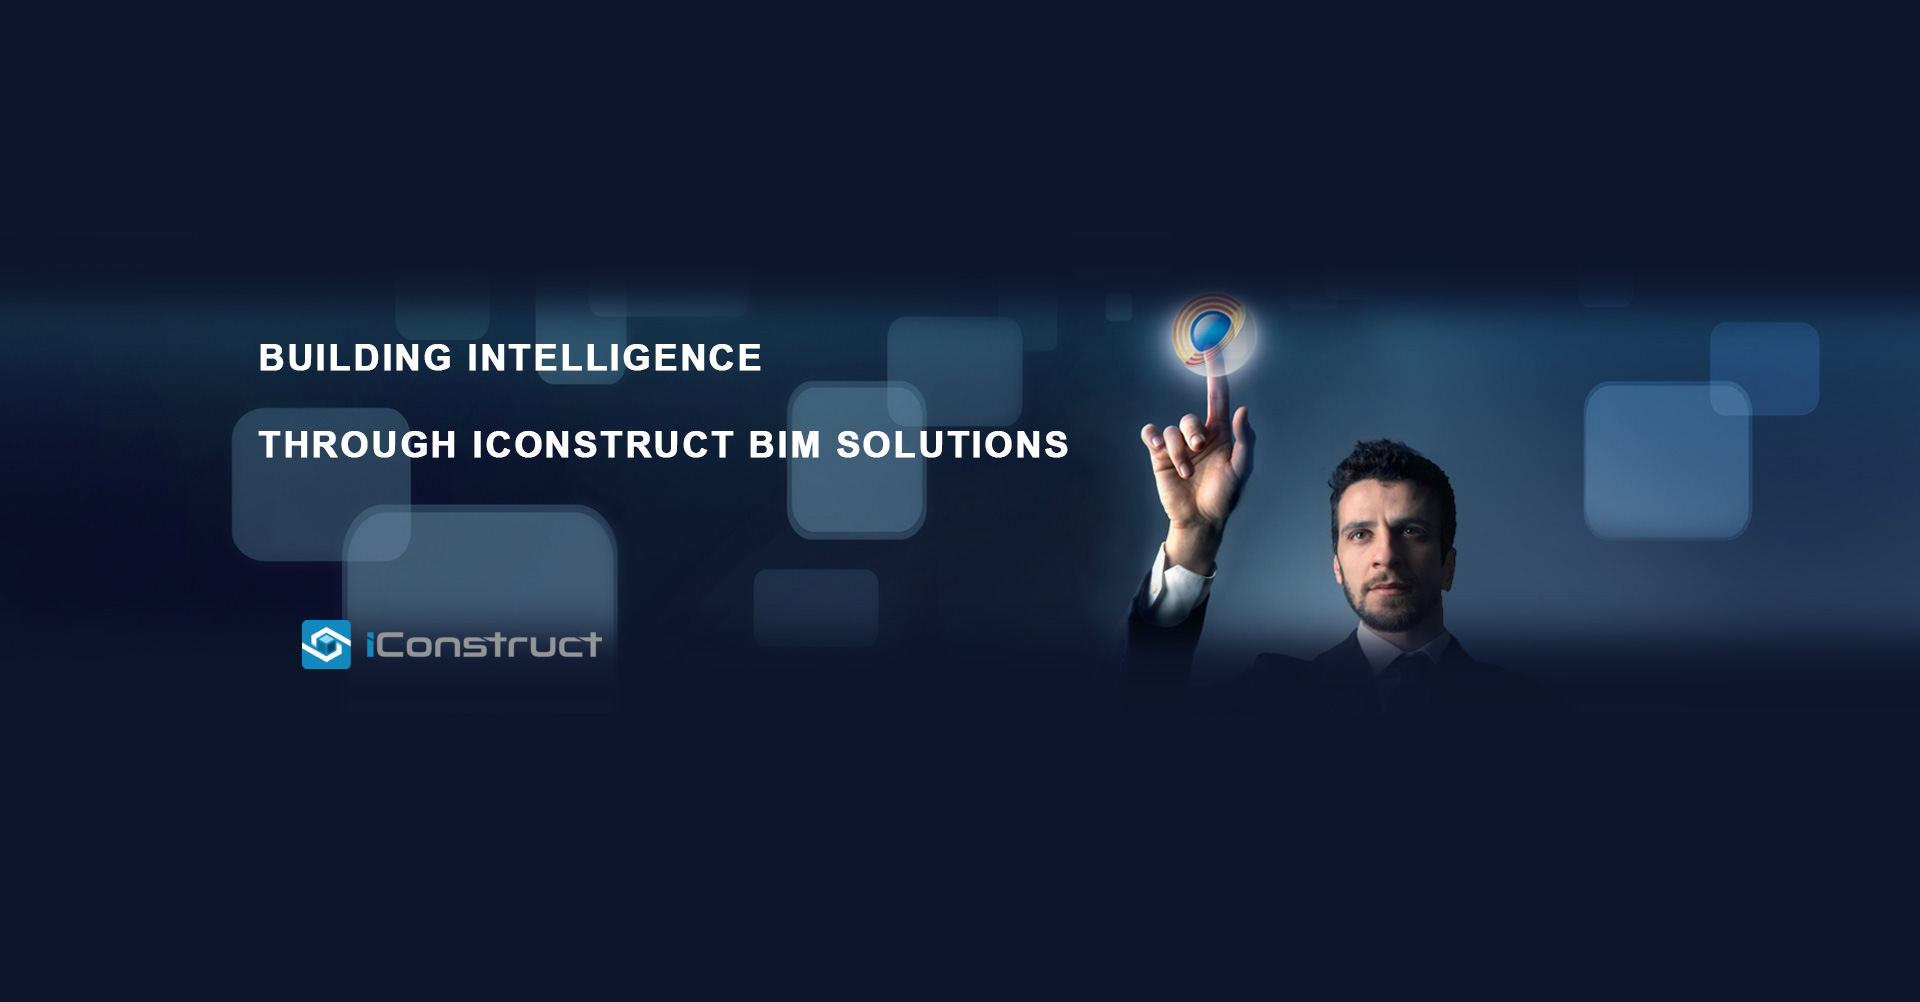 iConstruct